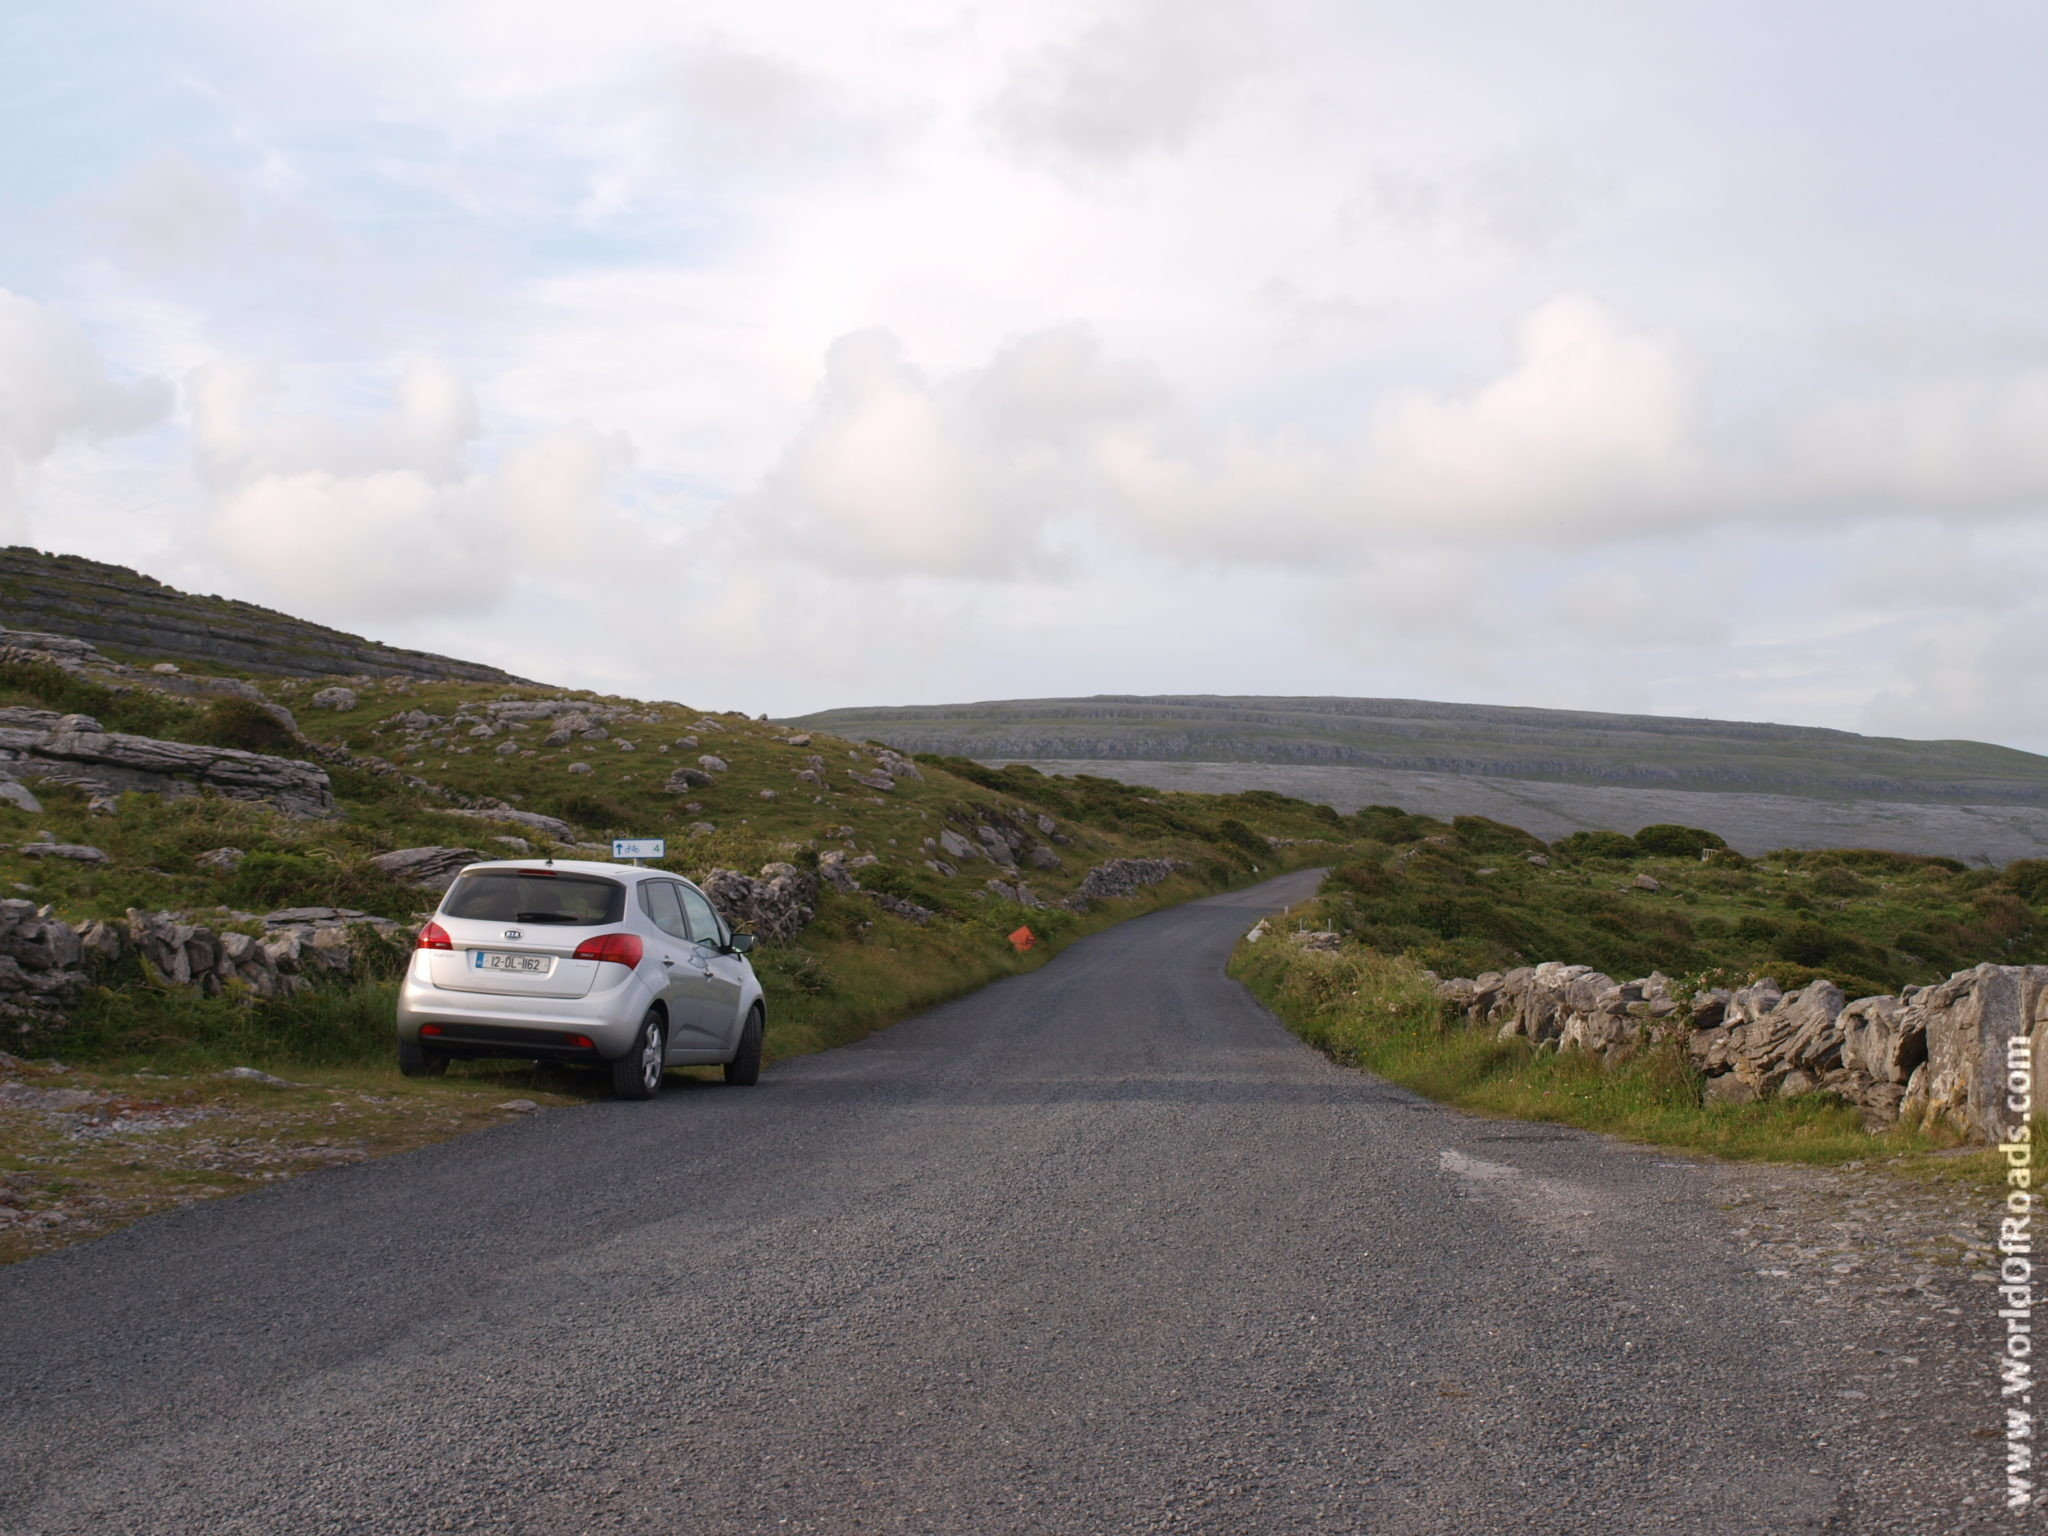 Kia Venga. Ирландское побережье.